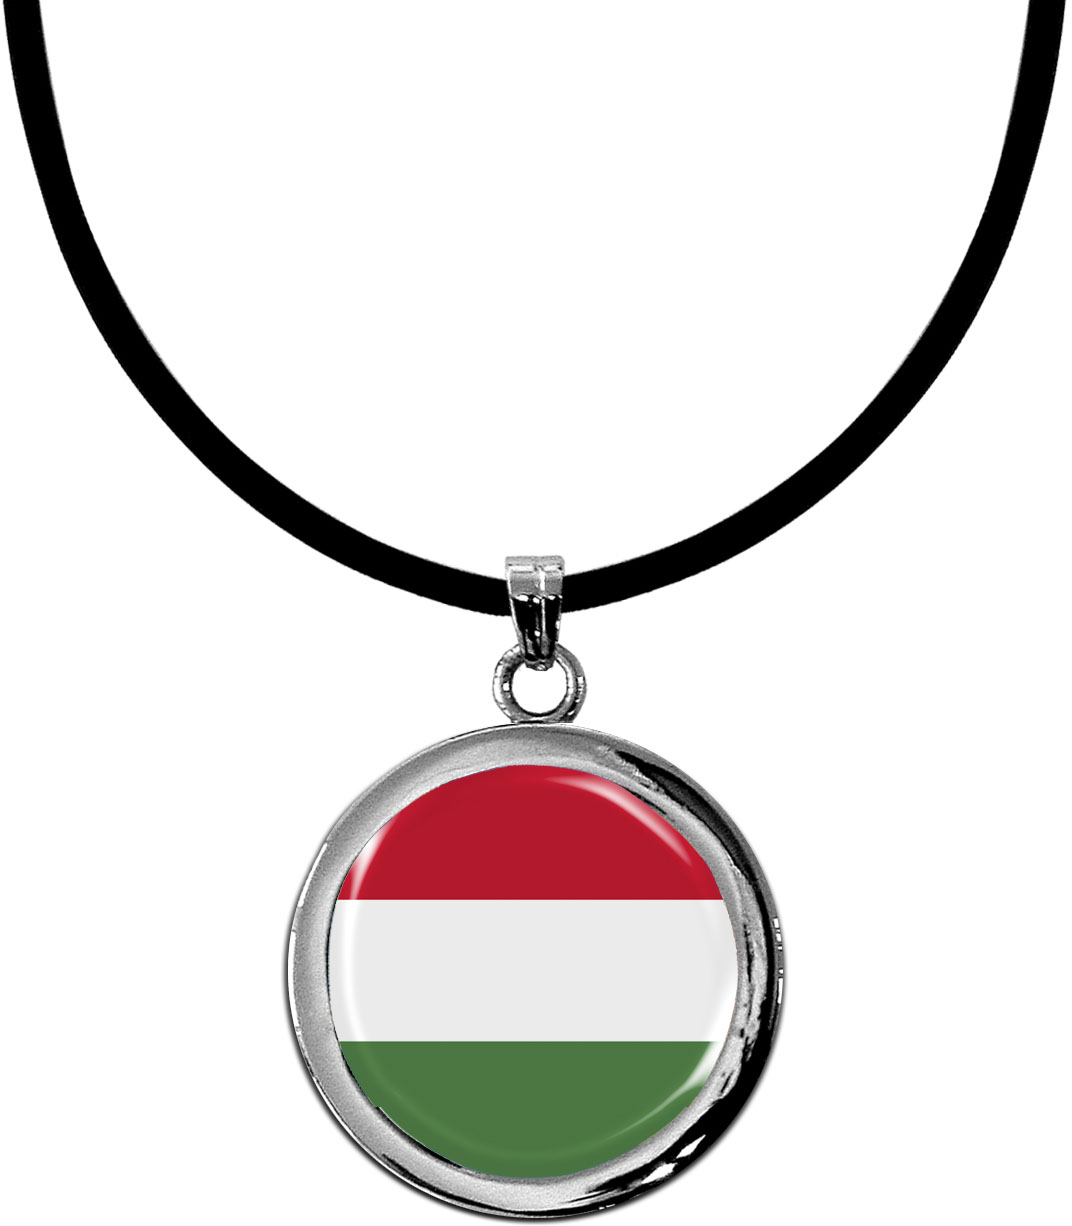 Kettenanhänger / Ungarn / Silikonband mit Silberverschluss